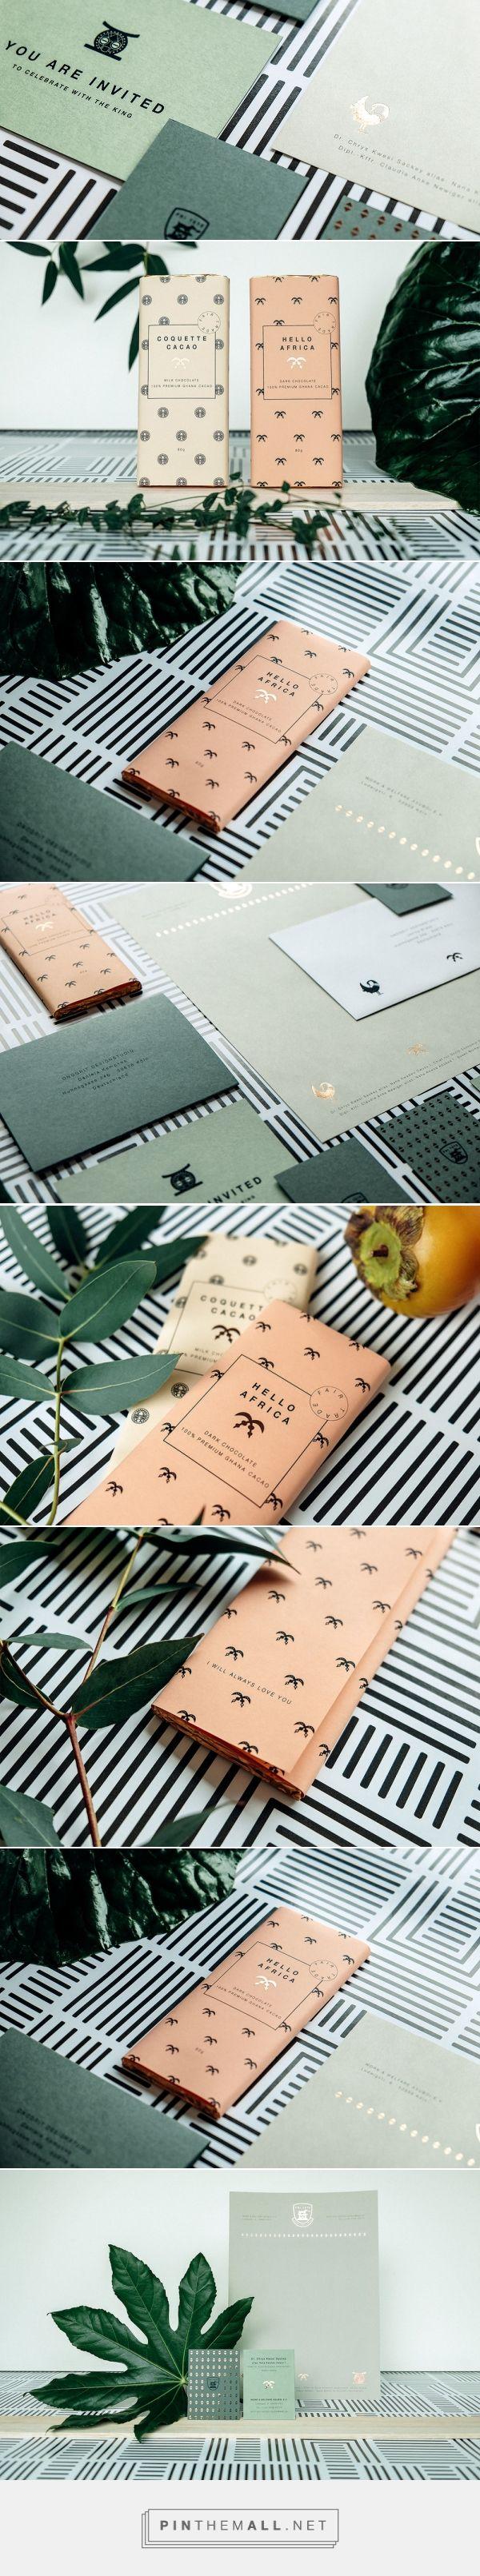 King Nana K. Owusu Stationery — The Dieline - Branding & Packaging Design…